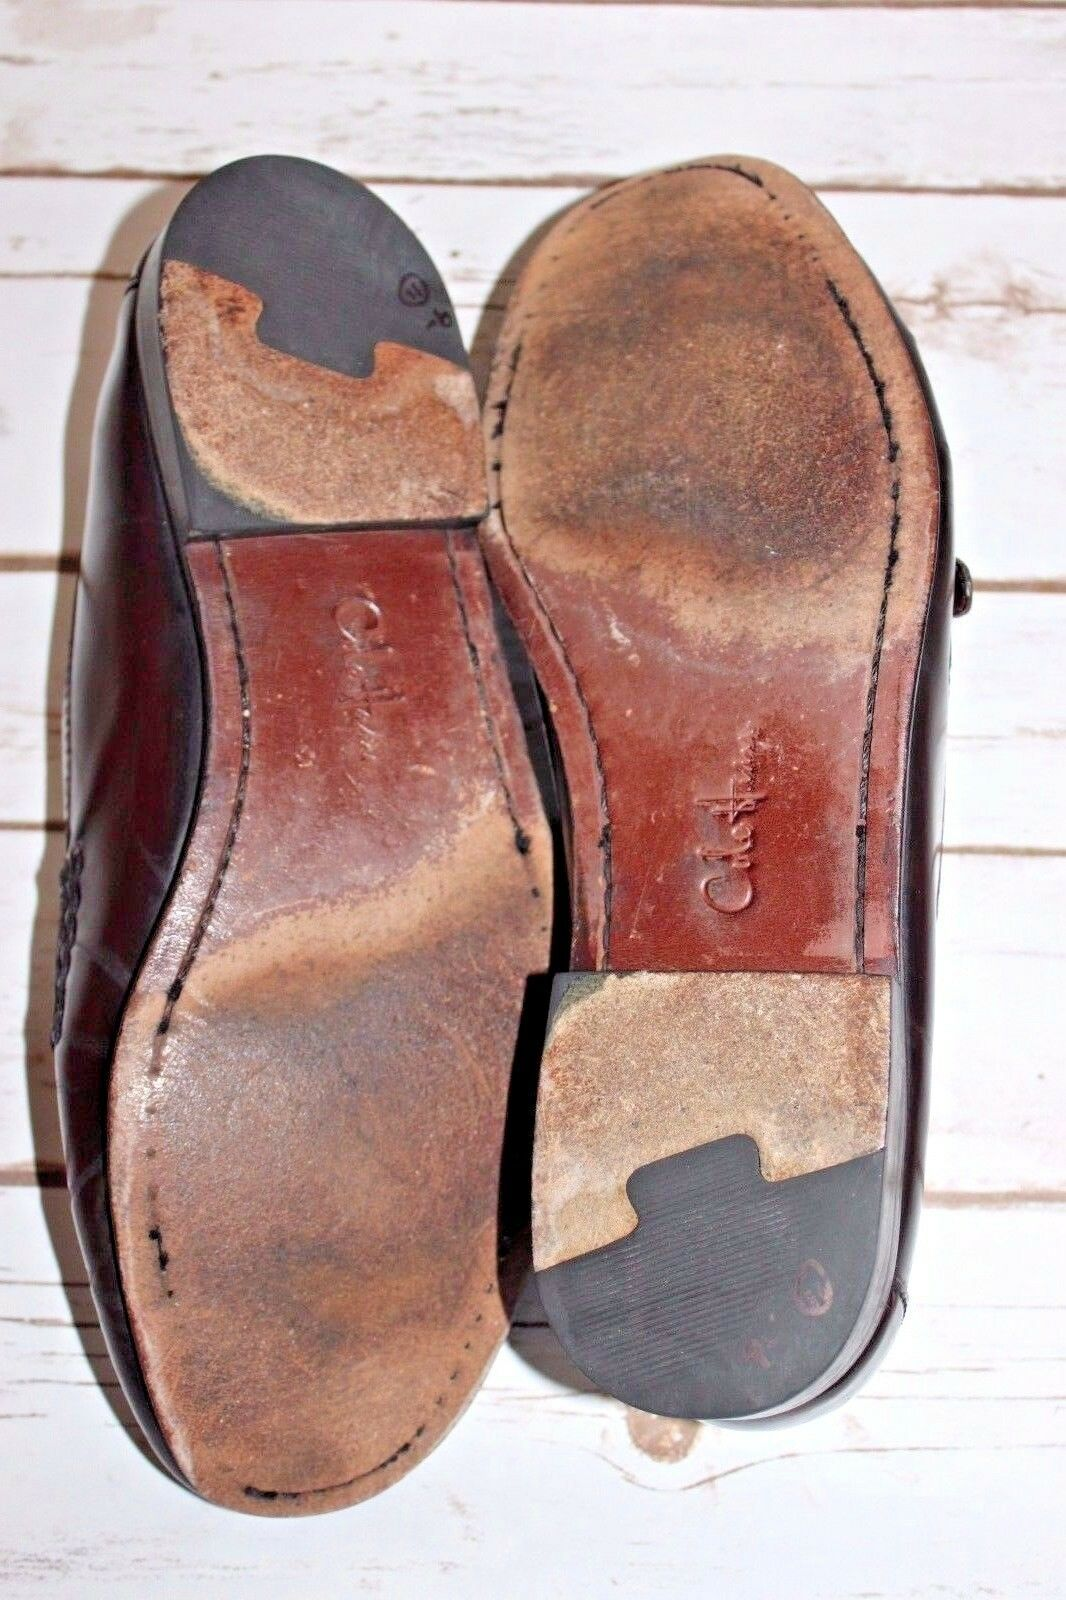 Cole Haan Men's 11.5 E Leather Slip On Loafers Fringe Kiltie Strap Buckle Wide